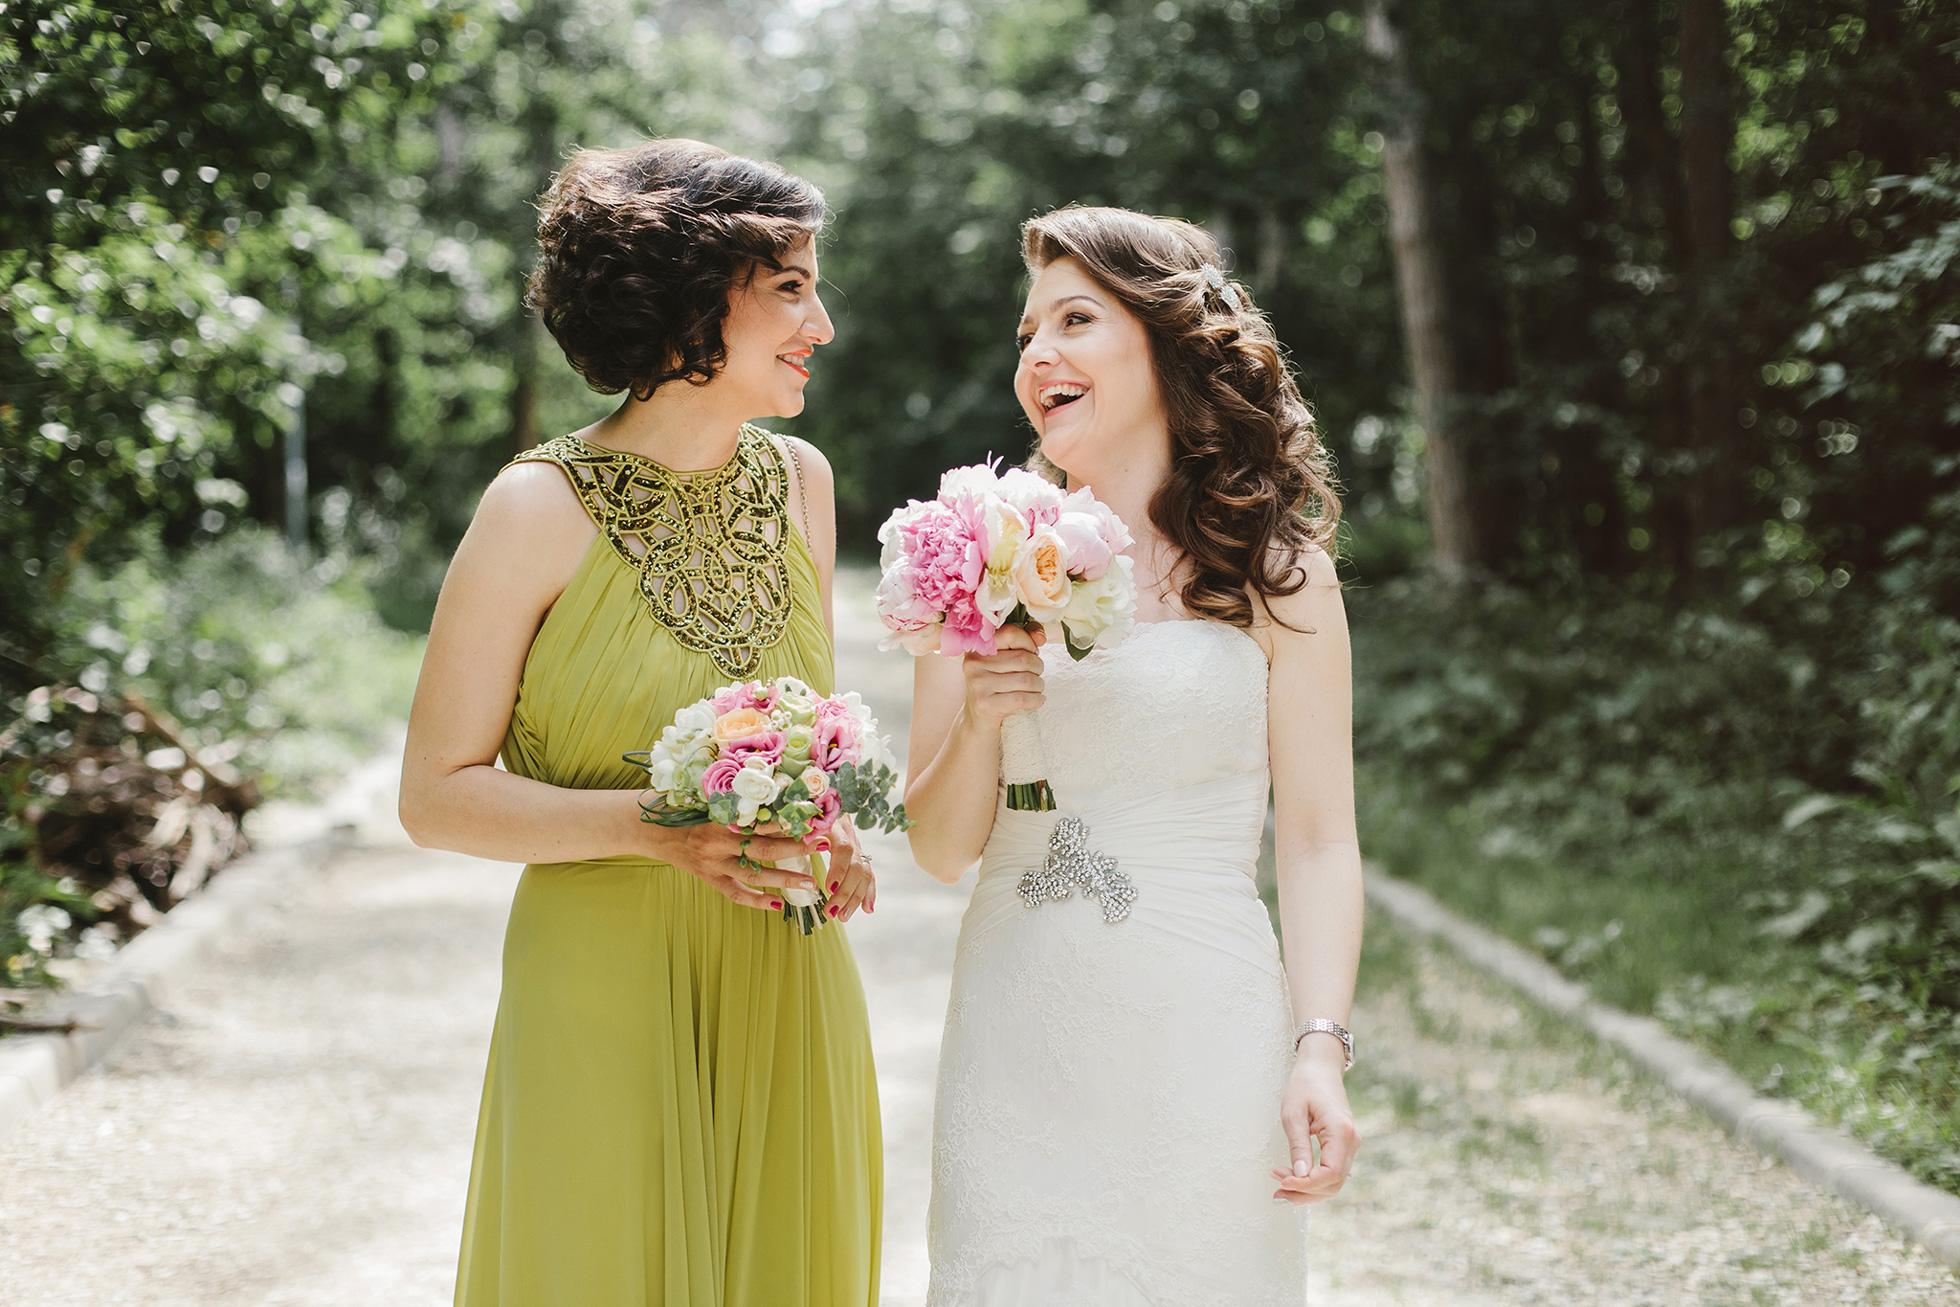 Liana-+-Florin-{wedding}-058